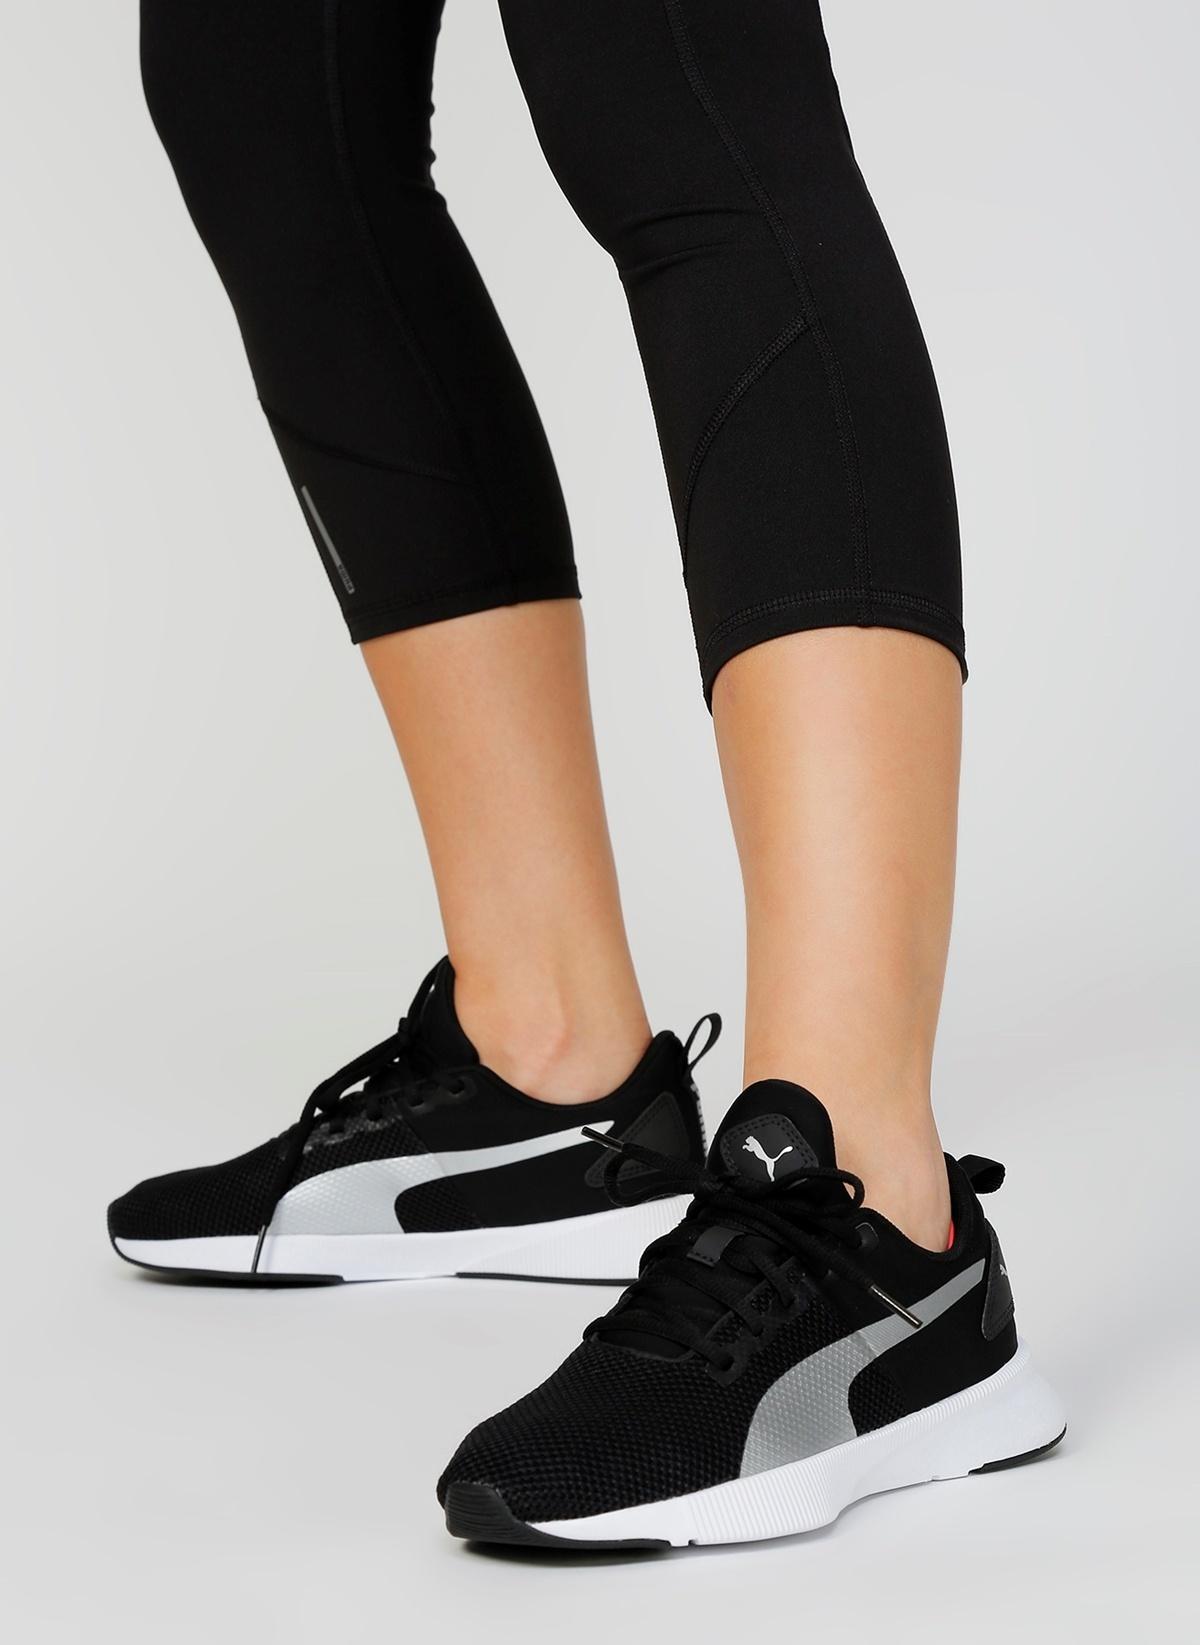 motivo Testa scalata  Puma Kadın Koşu Ayakkabısı Siyah | Morhipo | 27396635